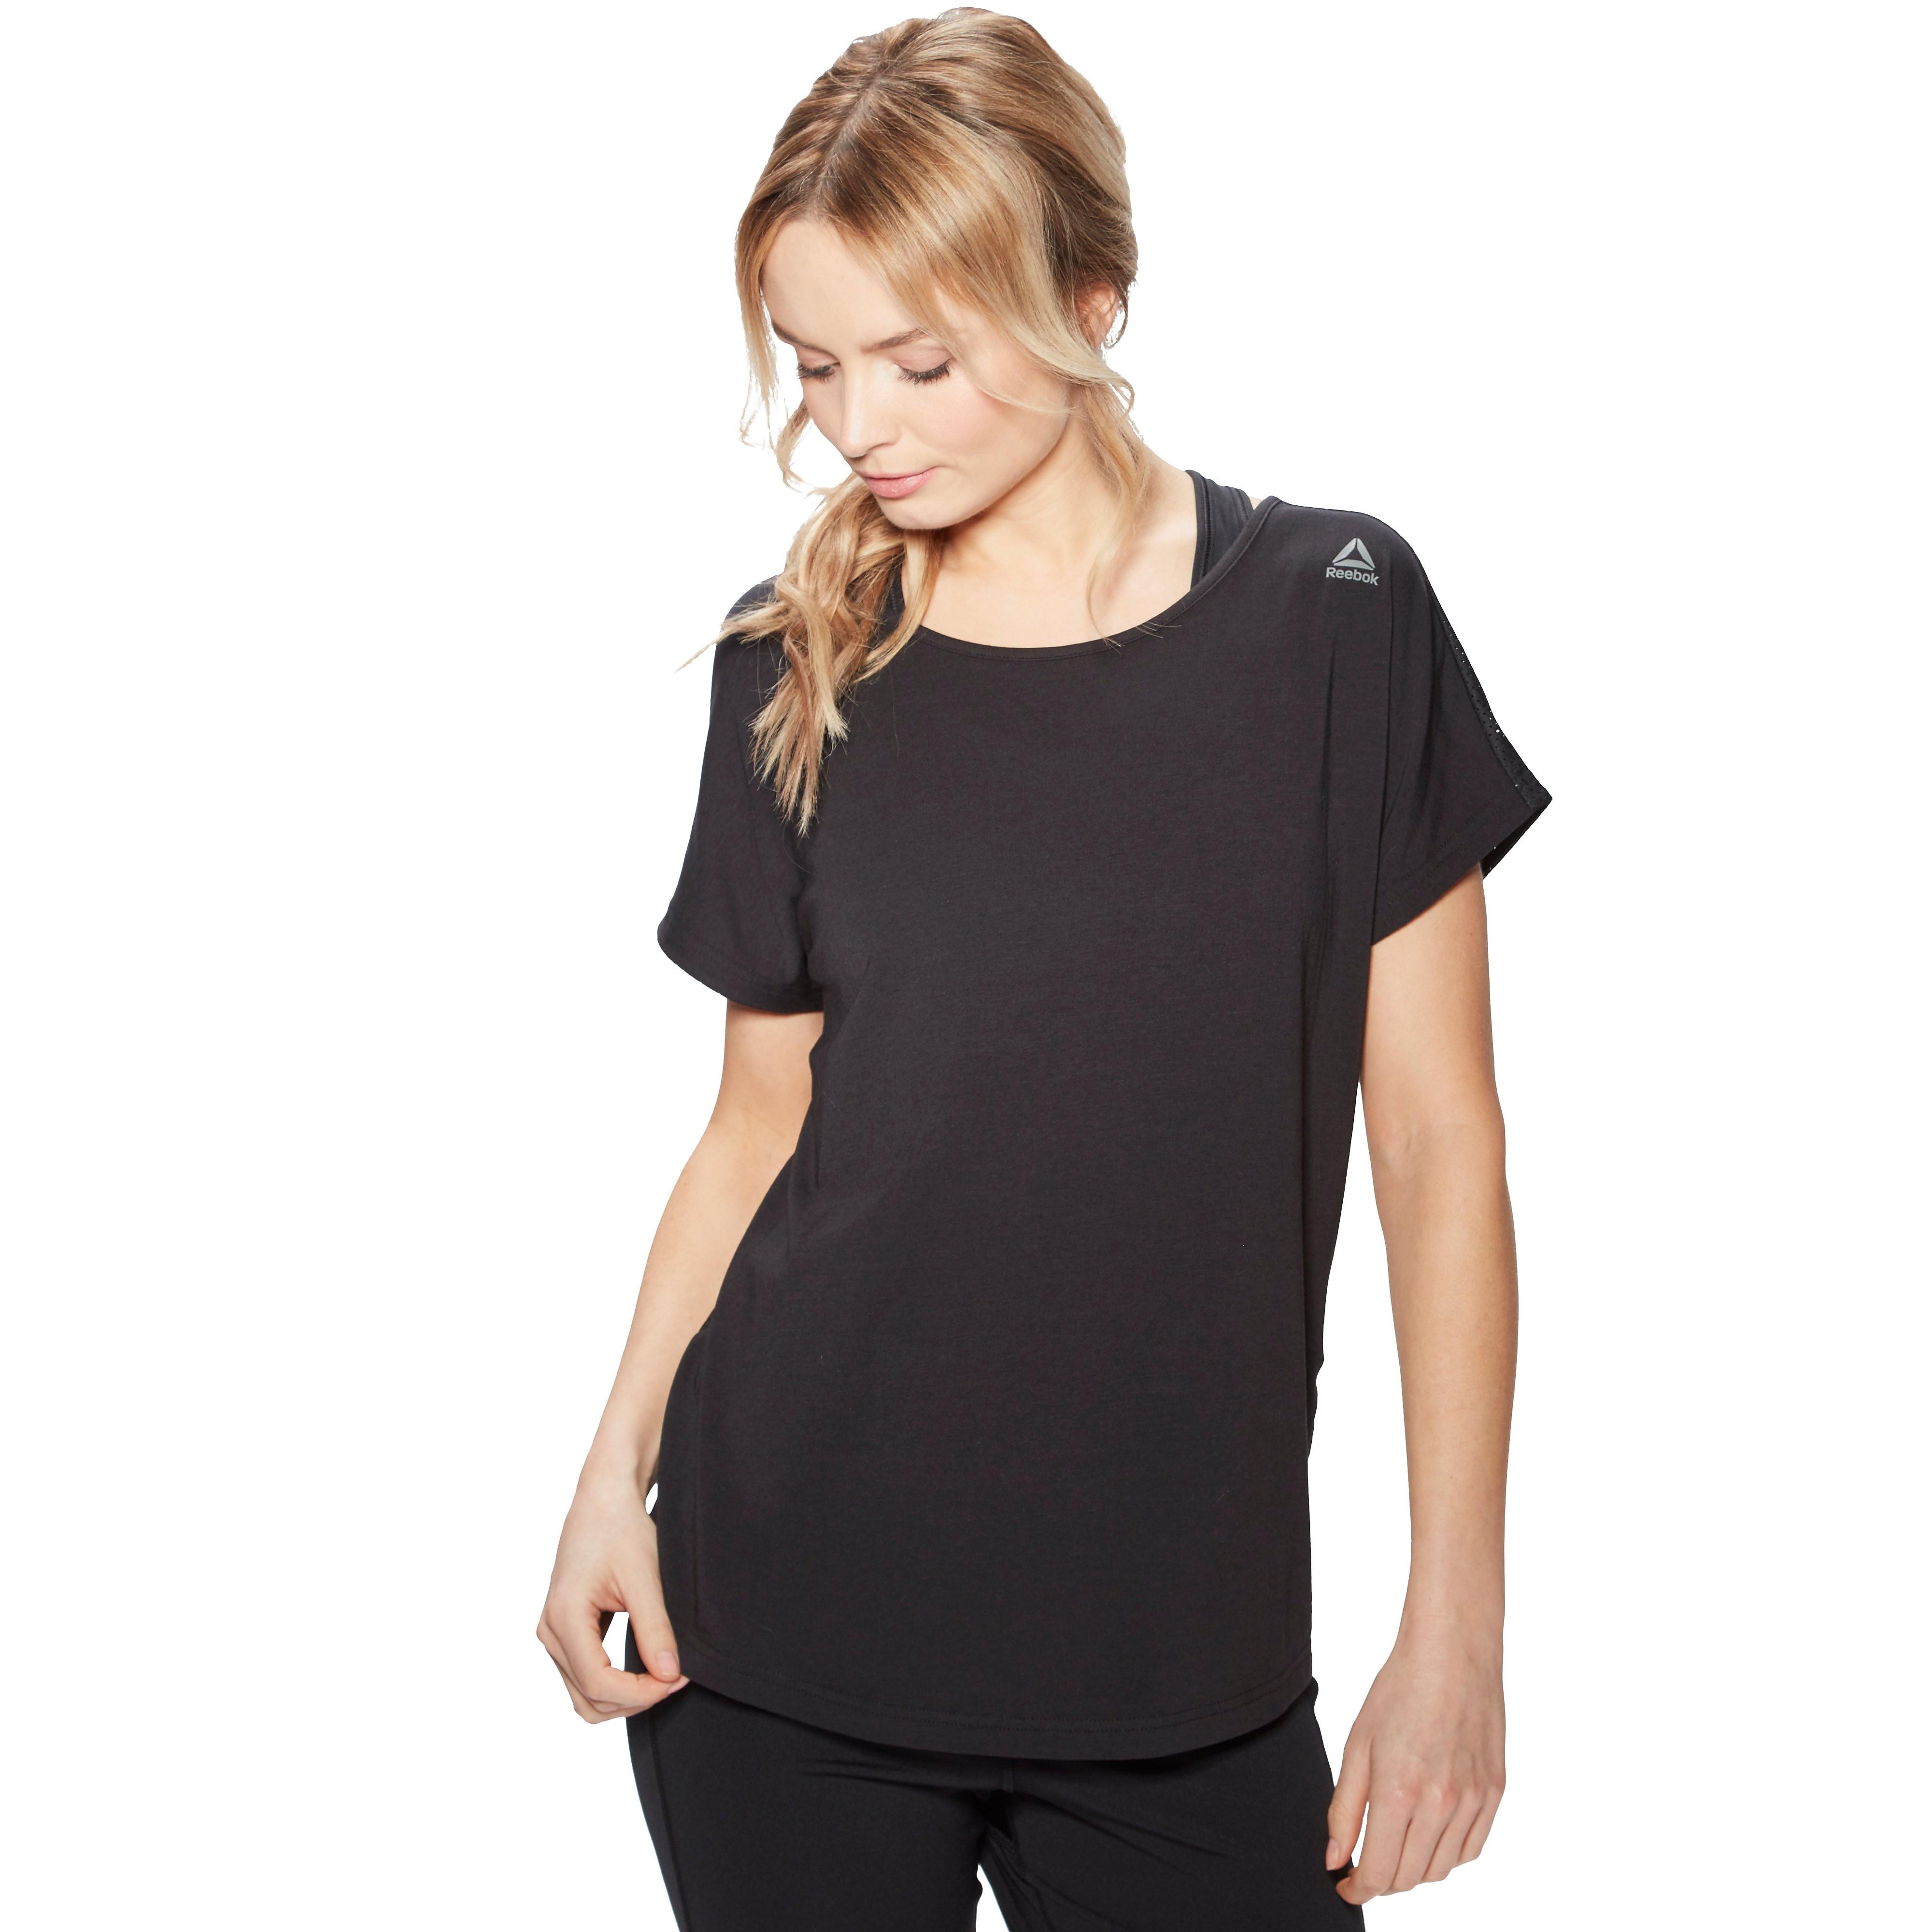 Women's Reebok Mesh Back T-Shirt - Black, Black